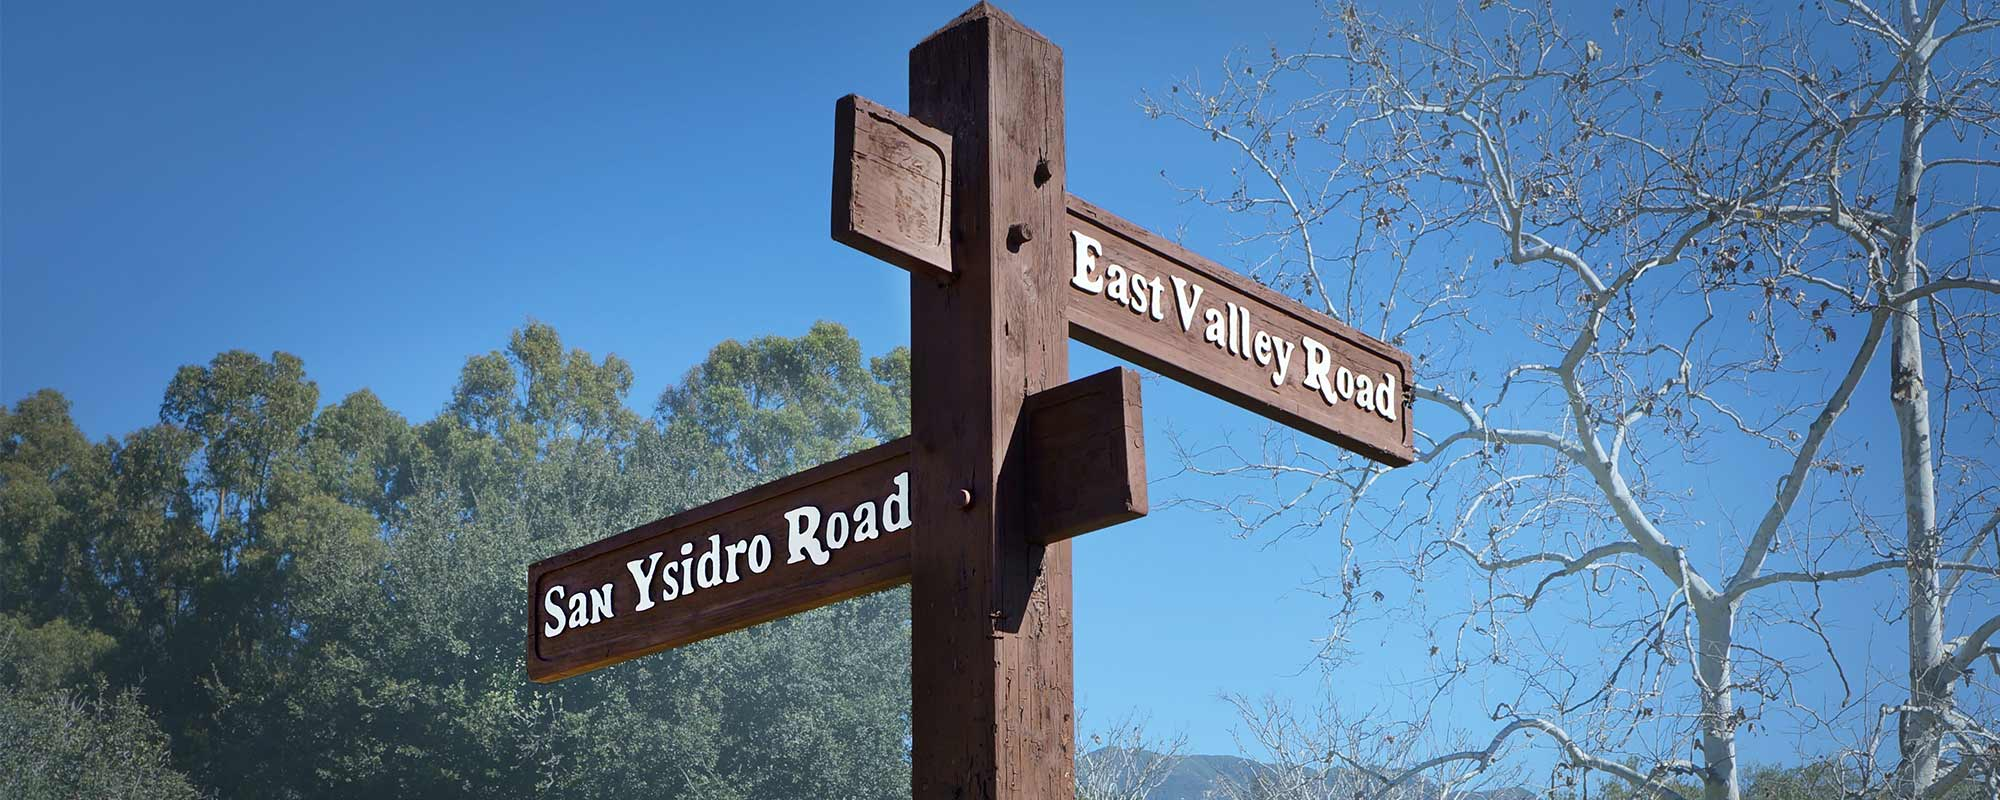 Enhancing the Uniqueness of Montecito